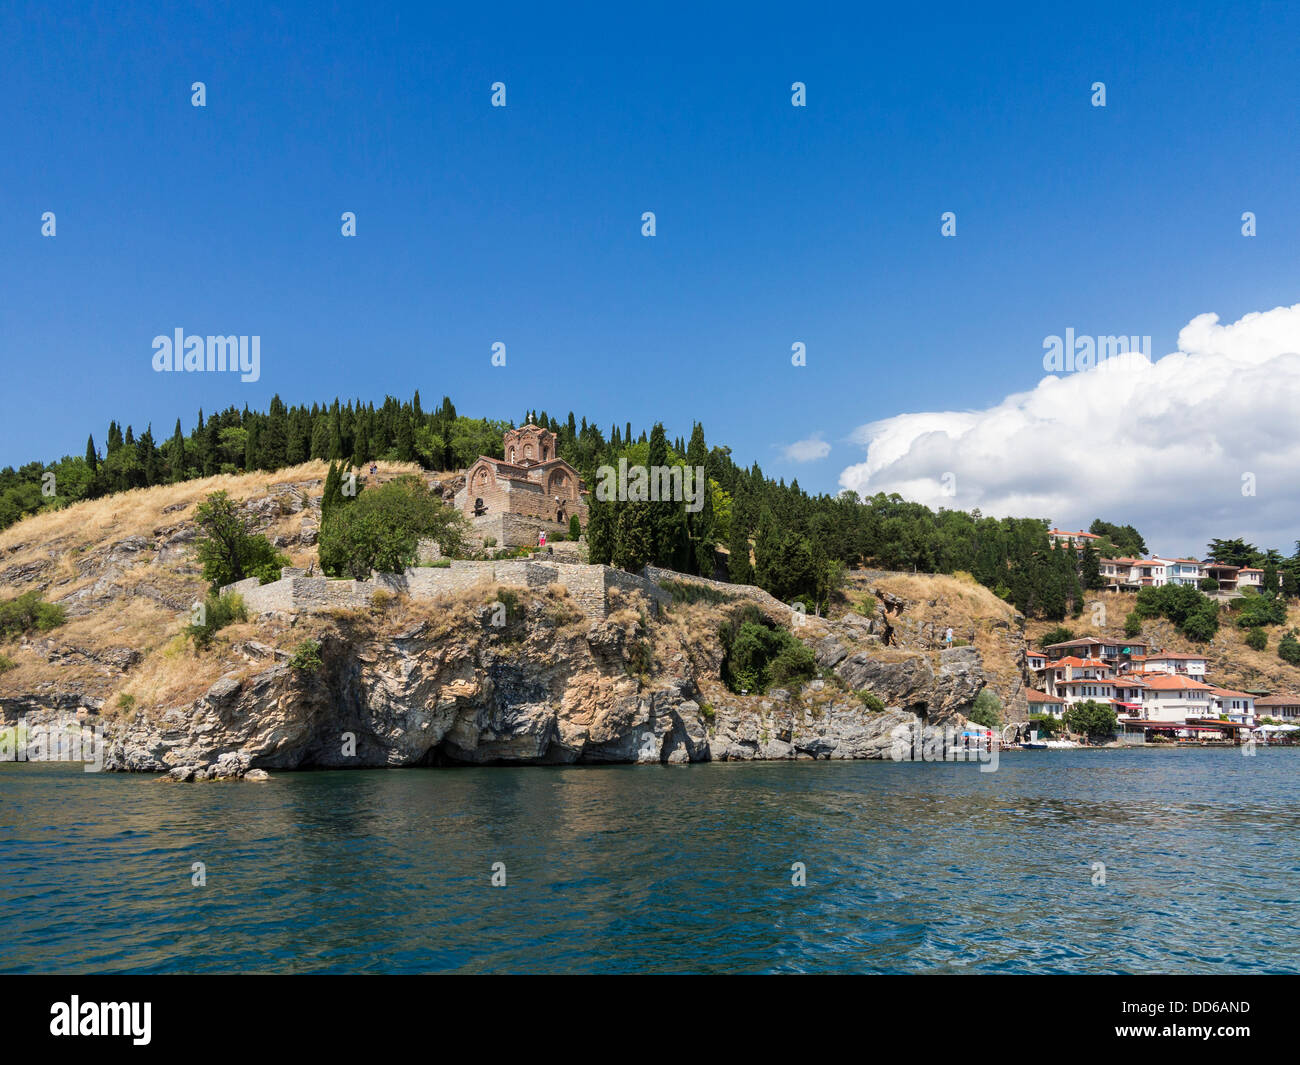 Church of St John / Sveti Jovan church overlooking the bay at Lake Ohrid, Macedonia, Europe - Stock Image